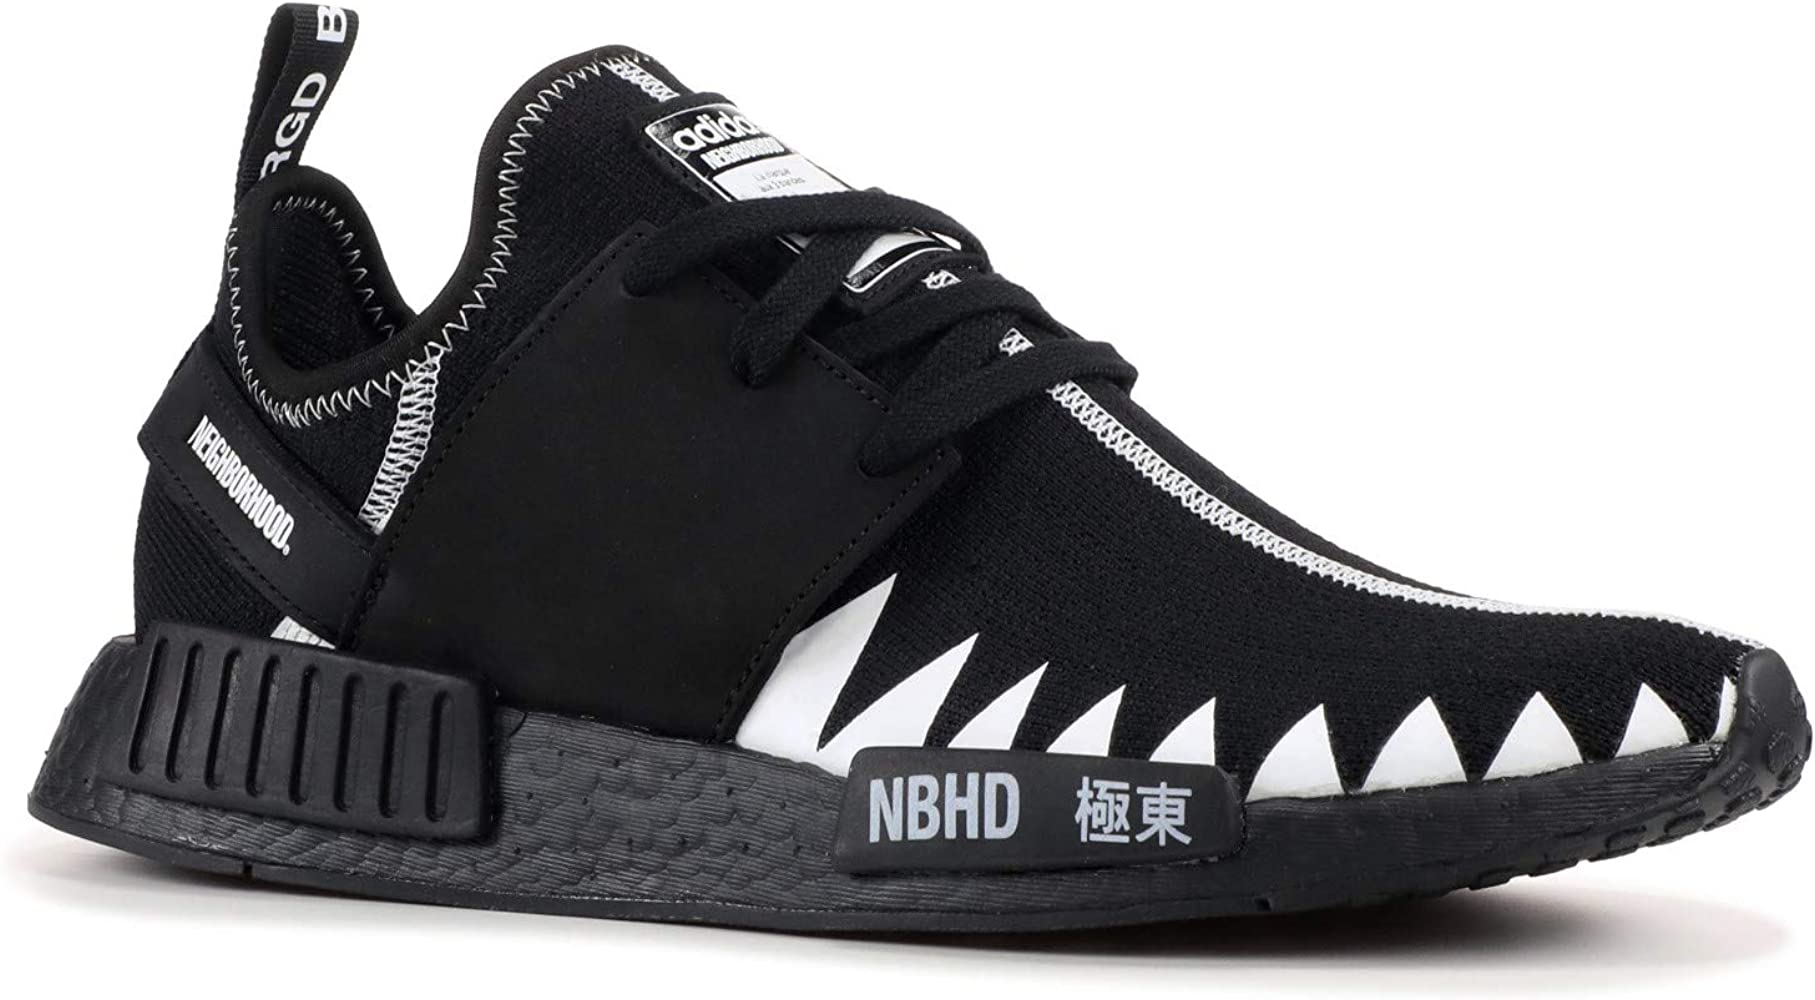 adidas NMD R1 Pk 'Neighborhood